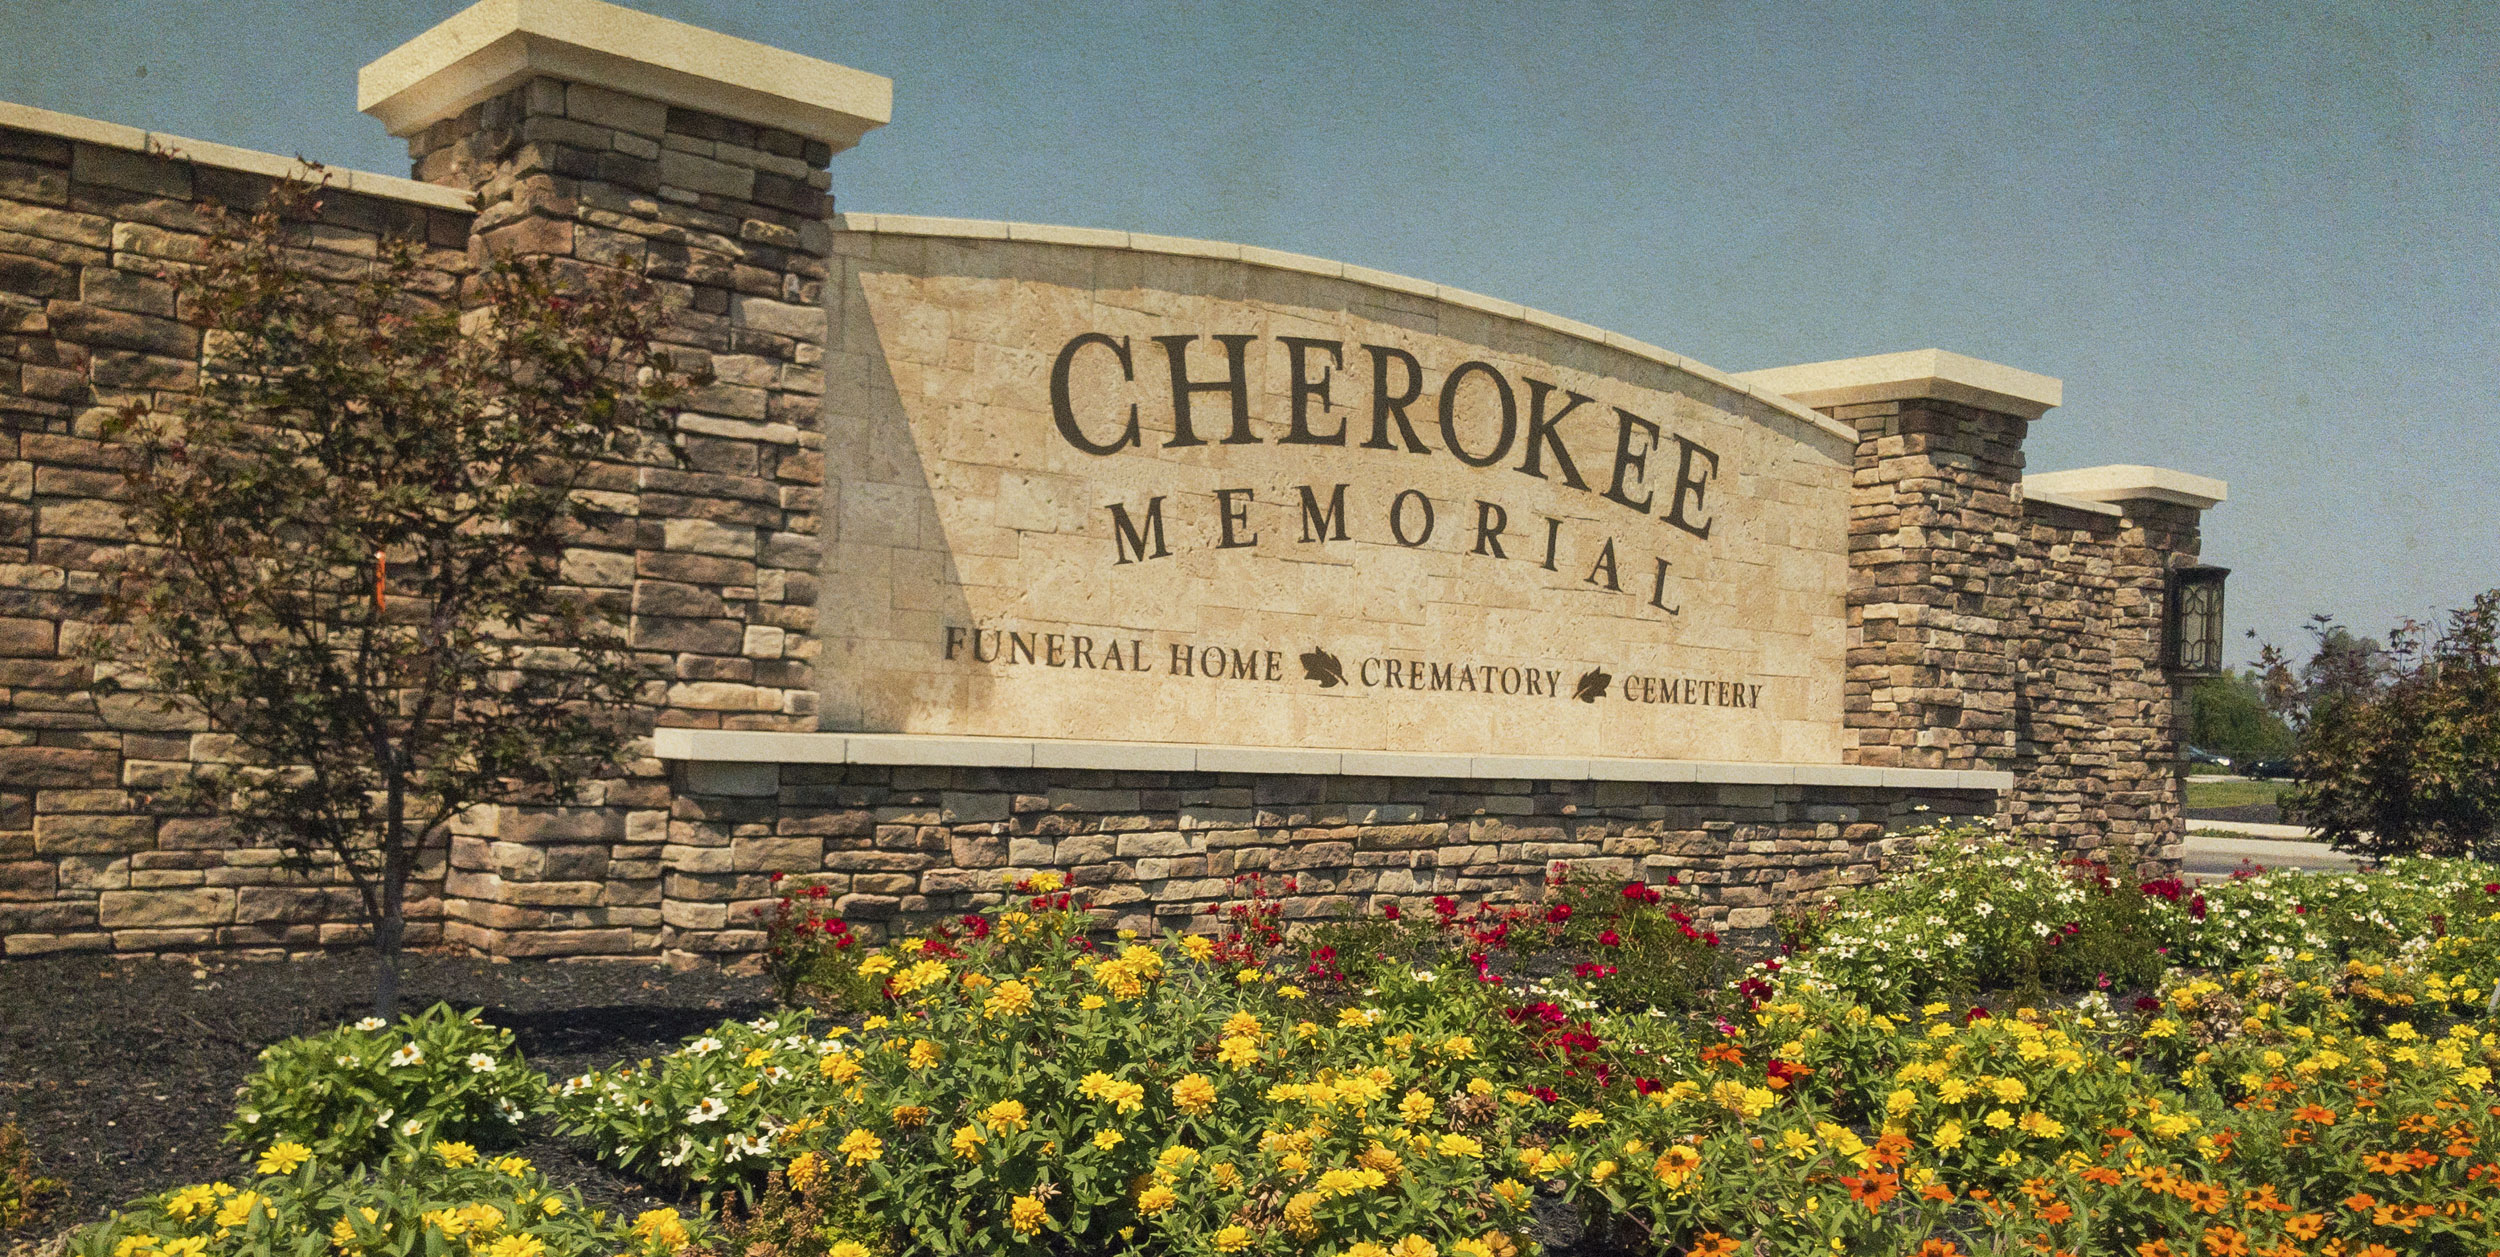 CherokeeMemorial_Banner_VitalStats.jpg